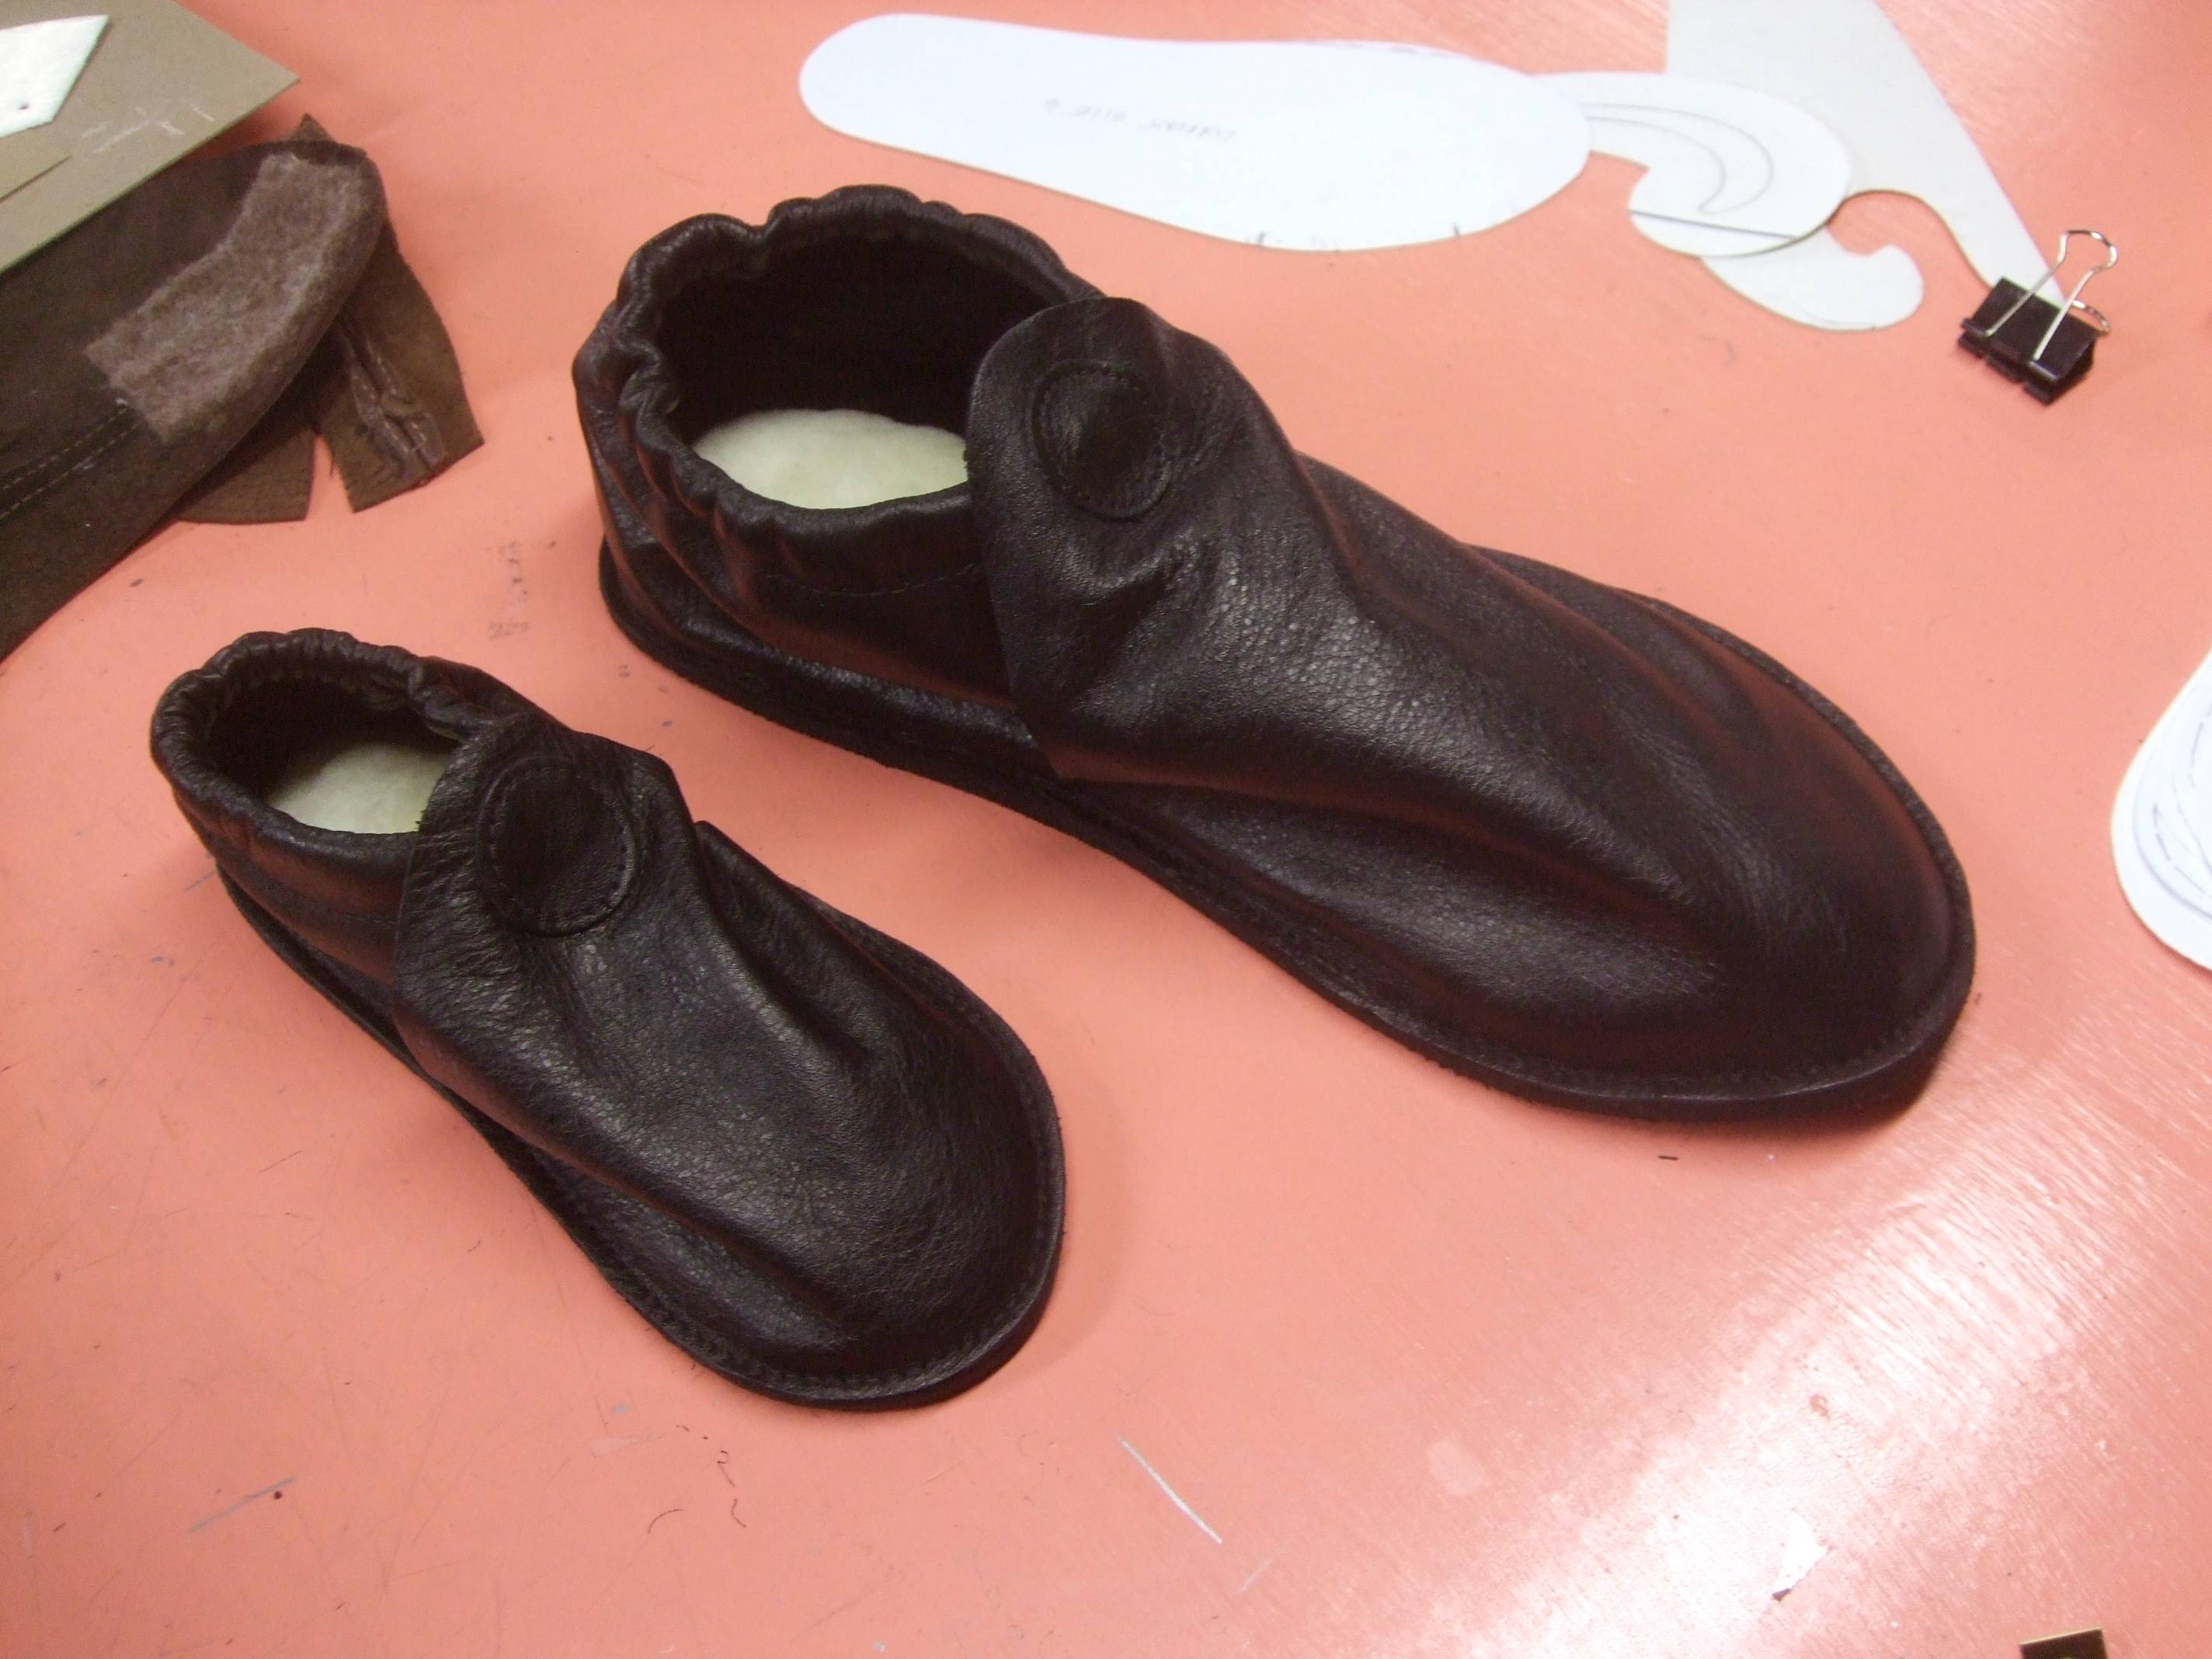 Size 15.5 Shoes